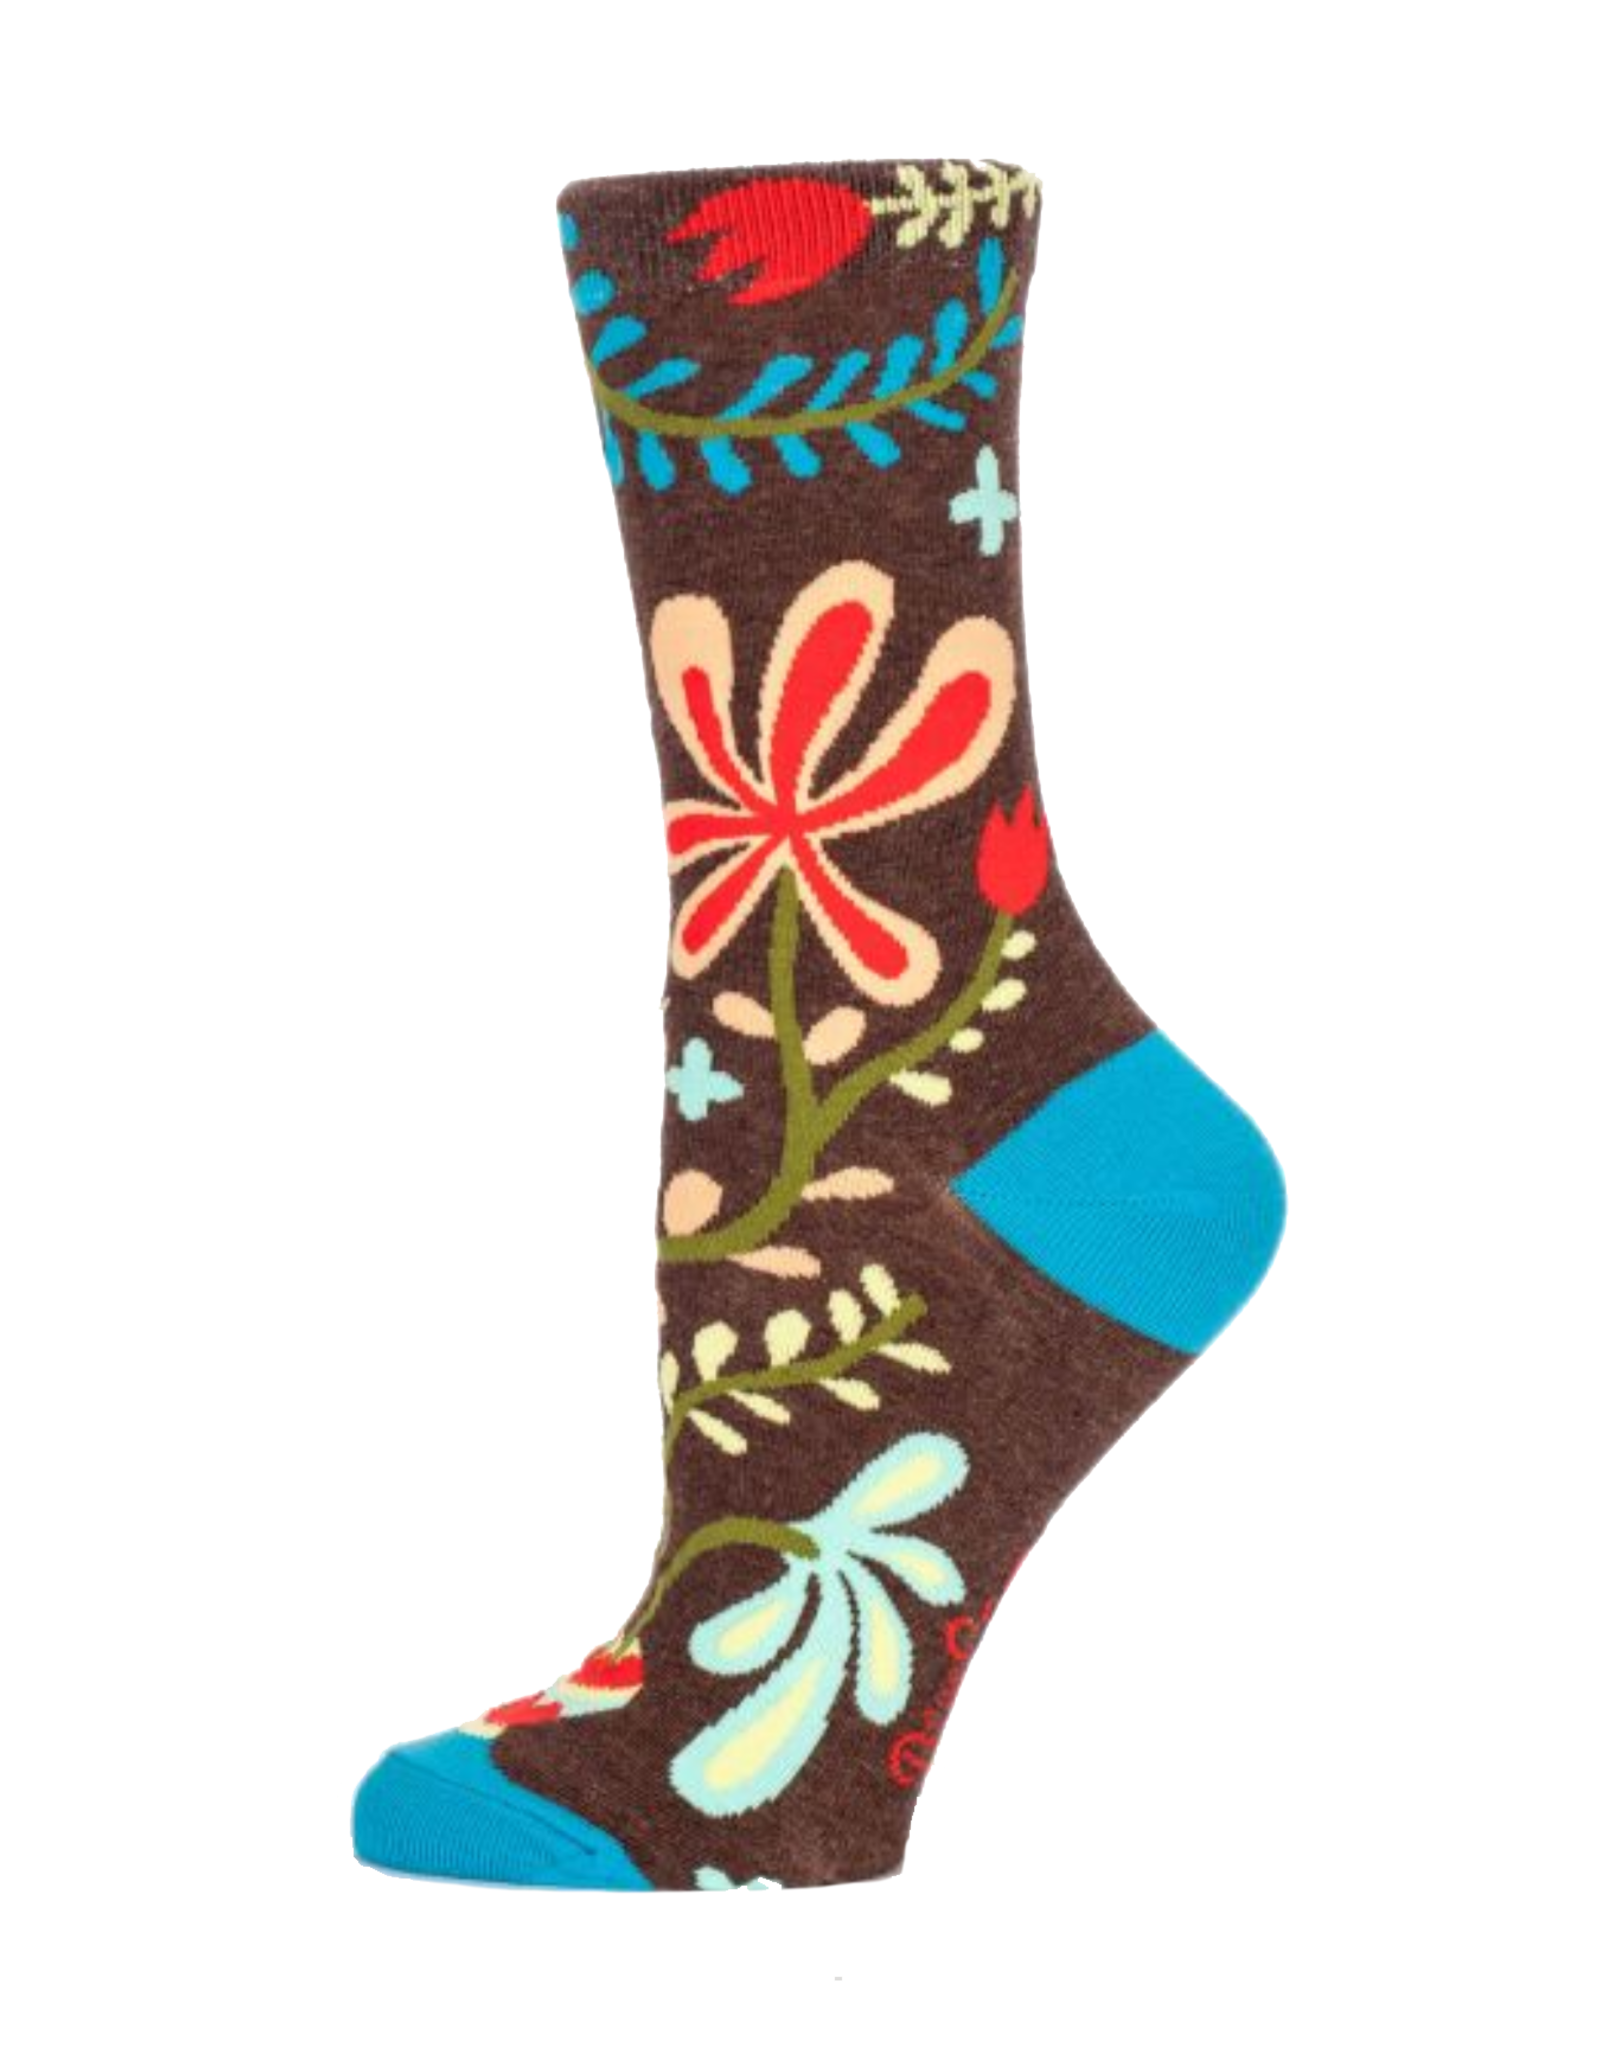 Dang It All To Heck Women's Crew Socks